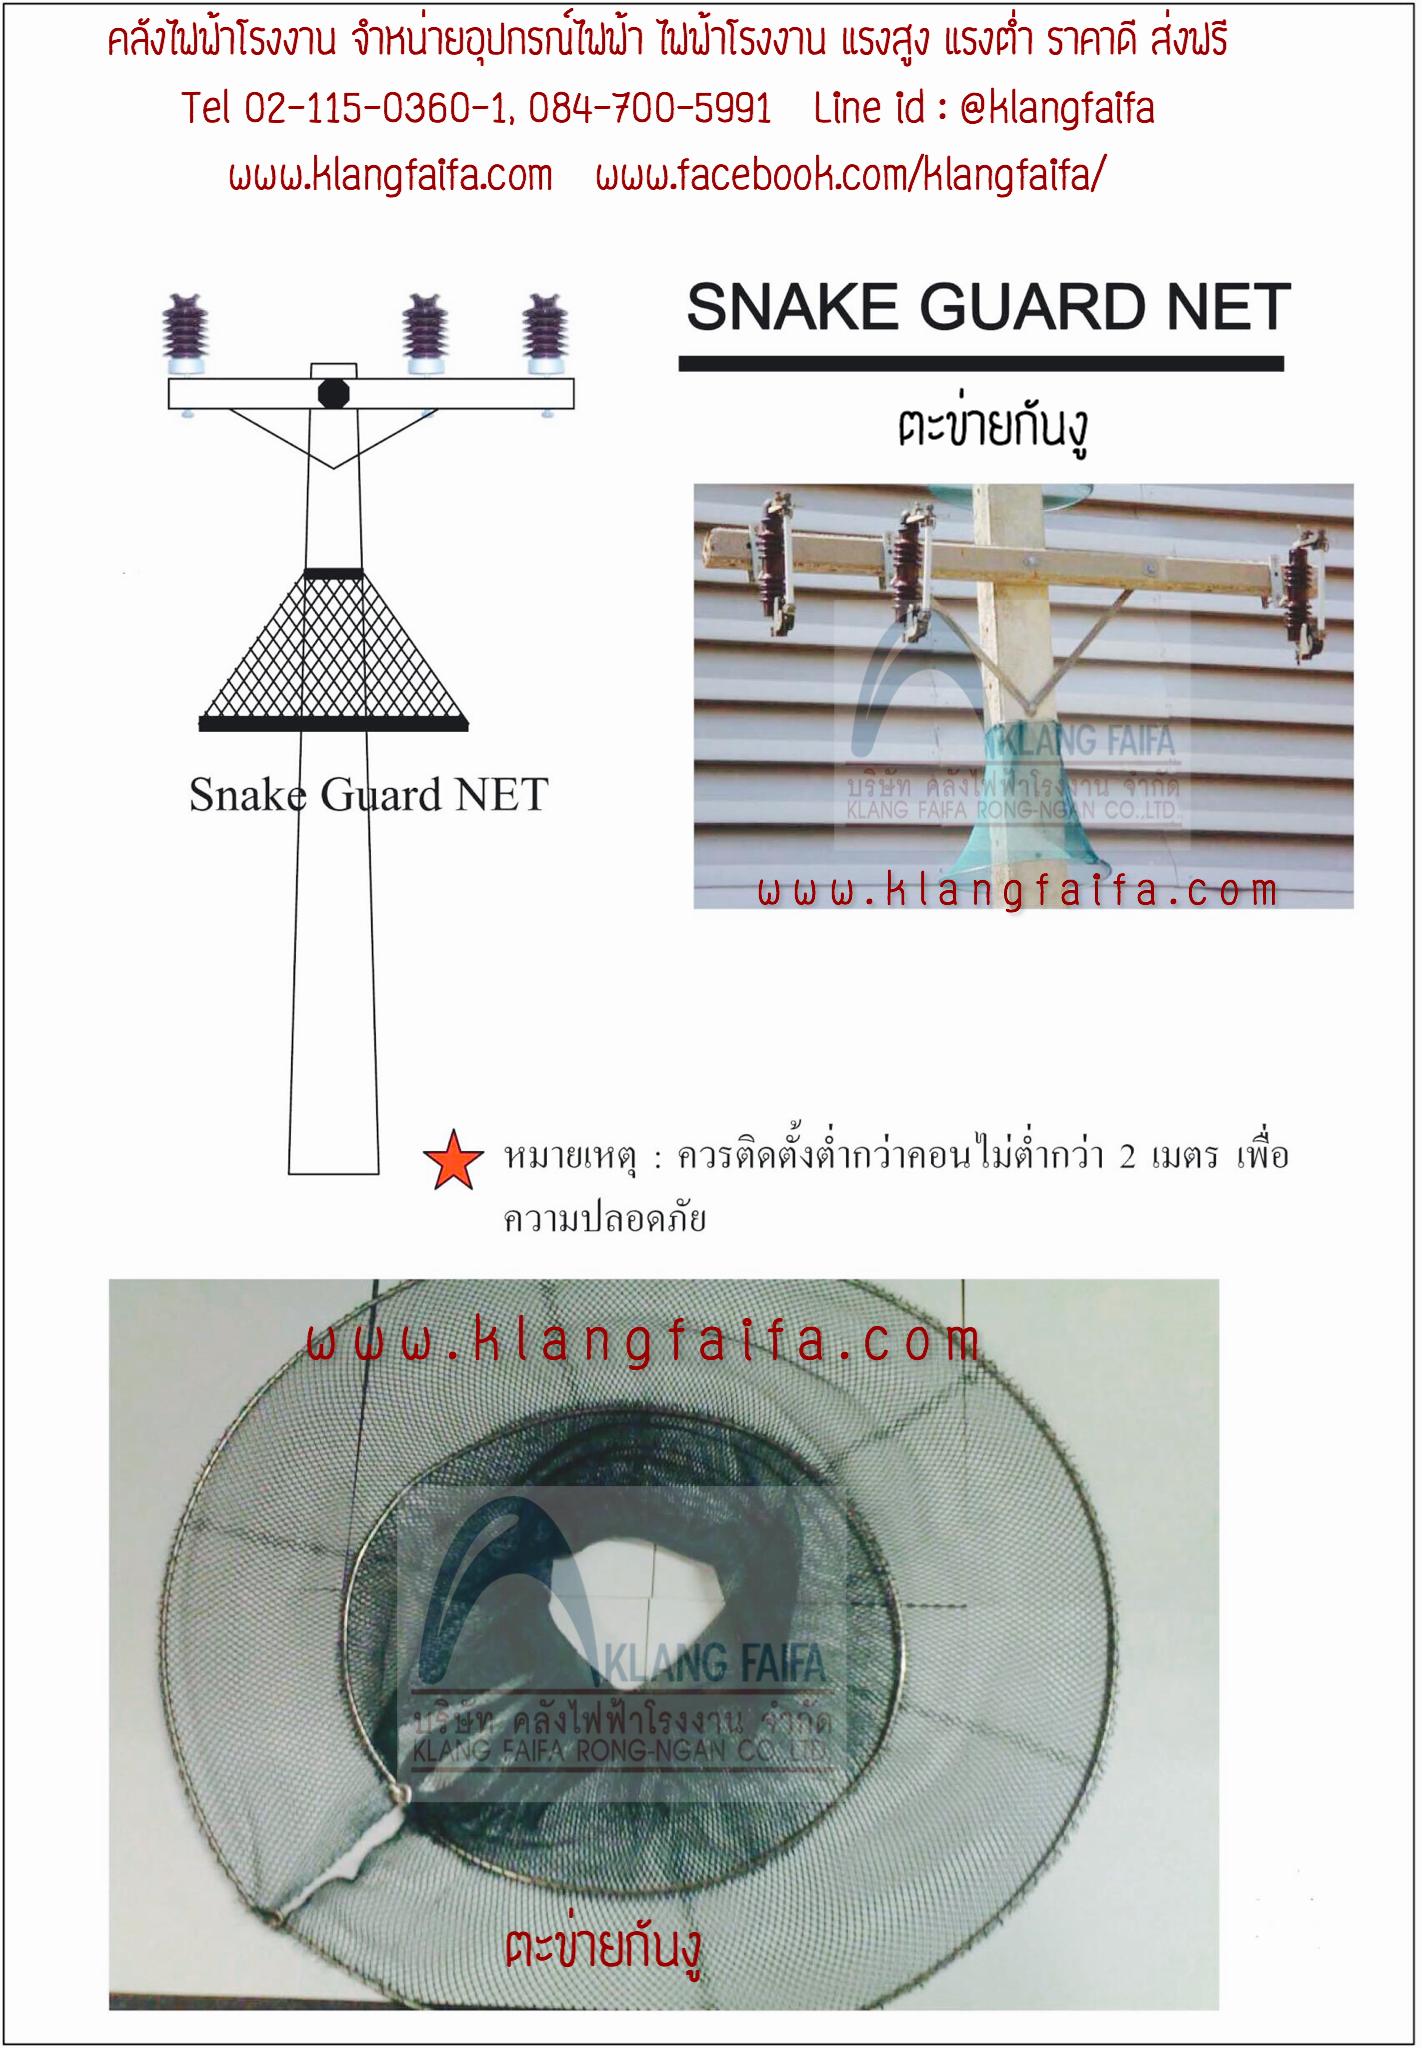 Snake guard net, ตะข่ายกันงู, ตาข่ายกันงู, Snakeguardnet